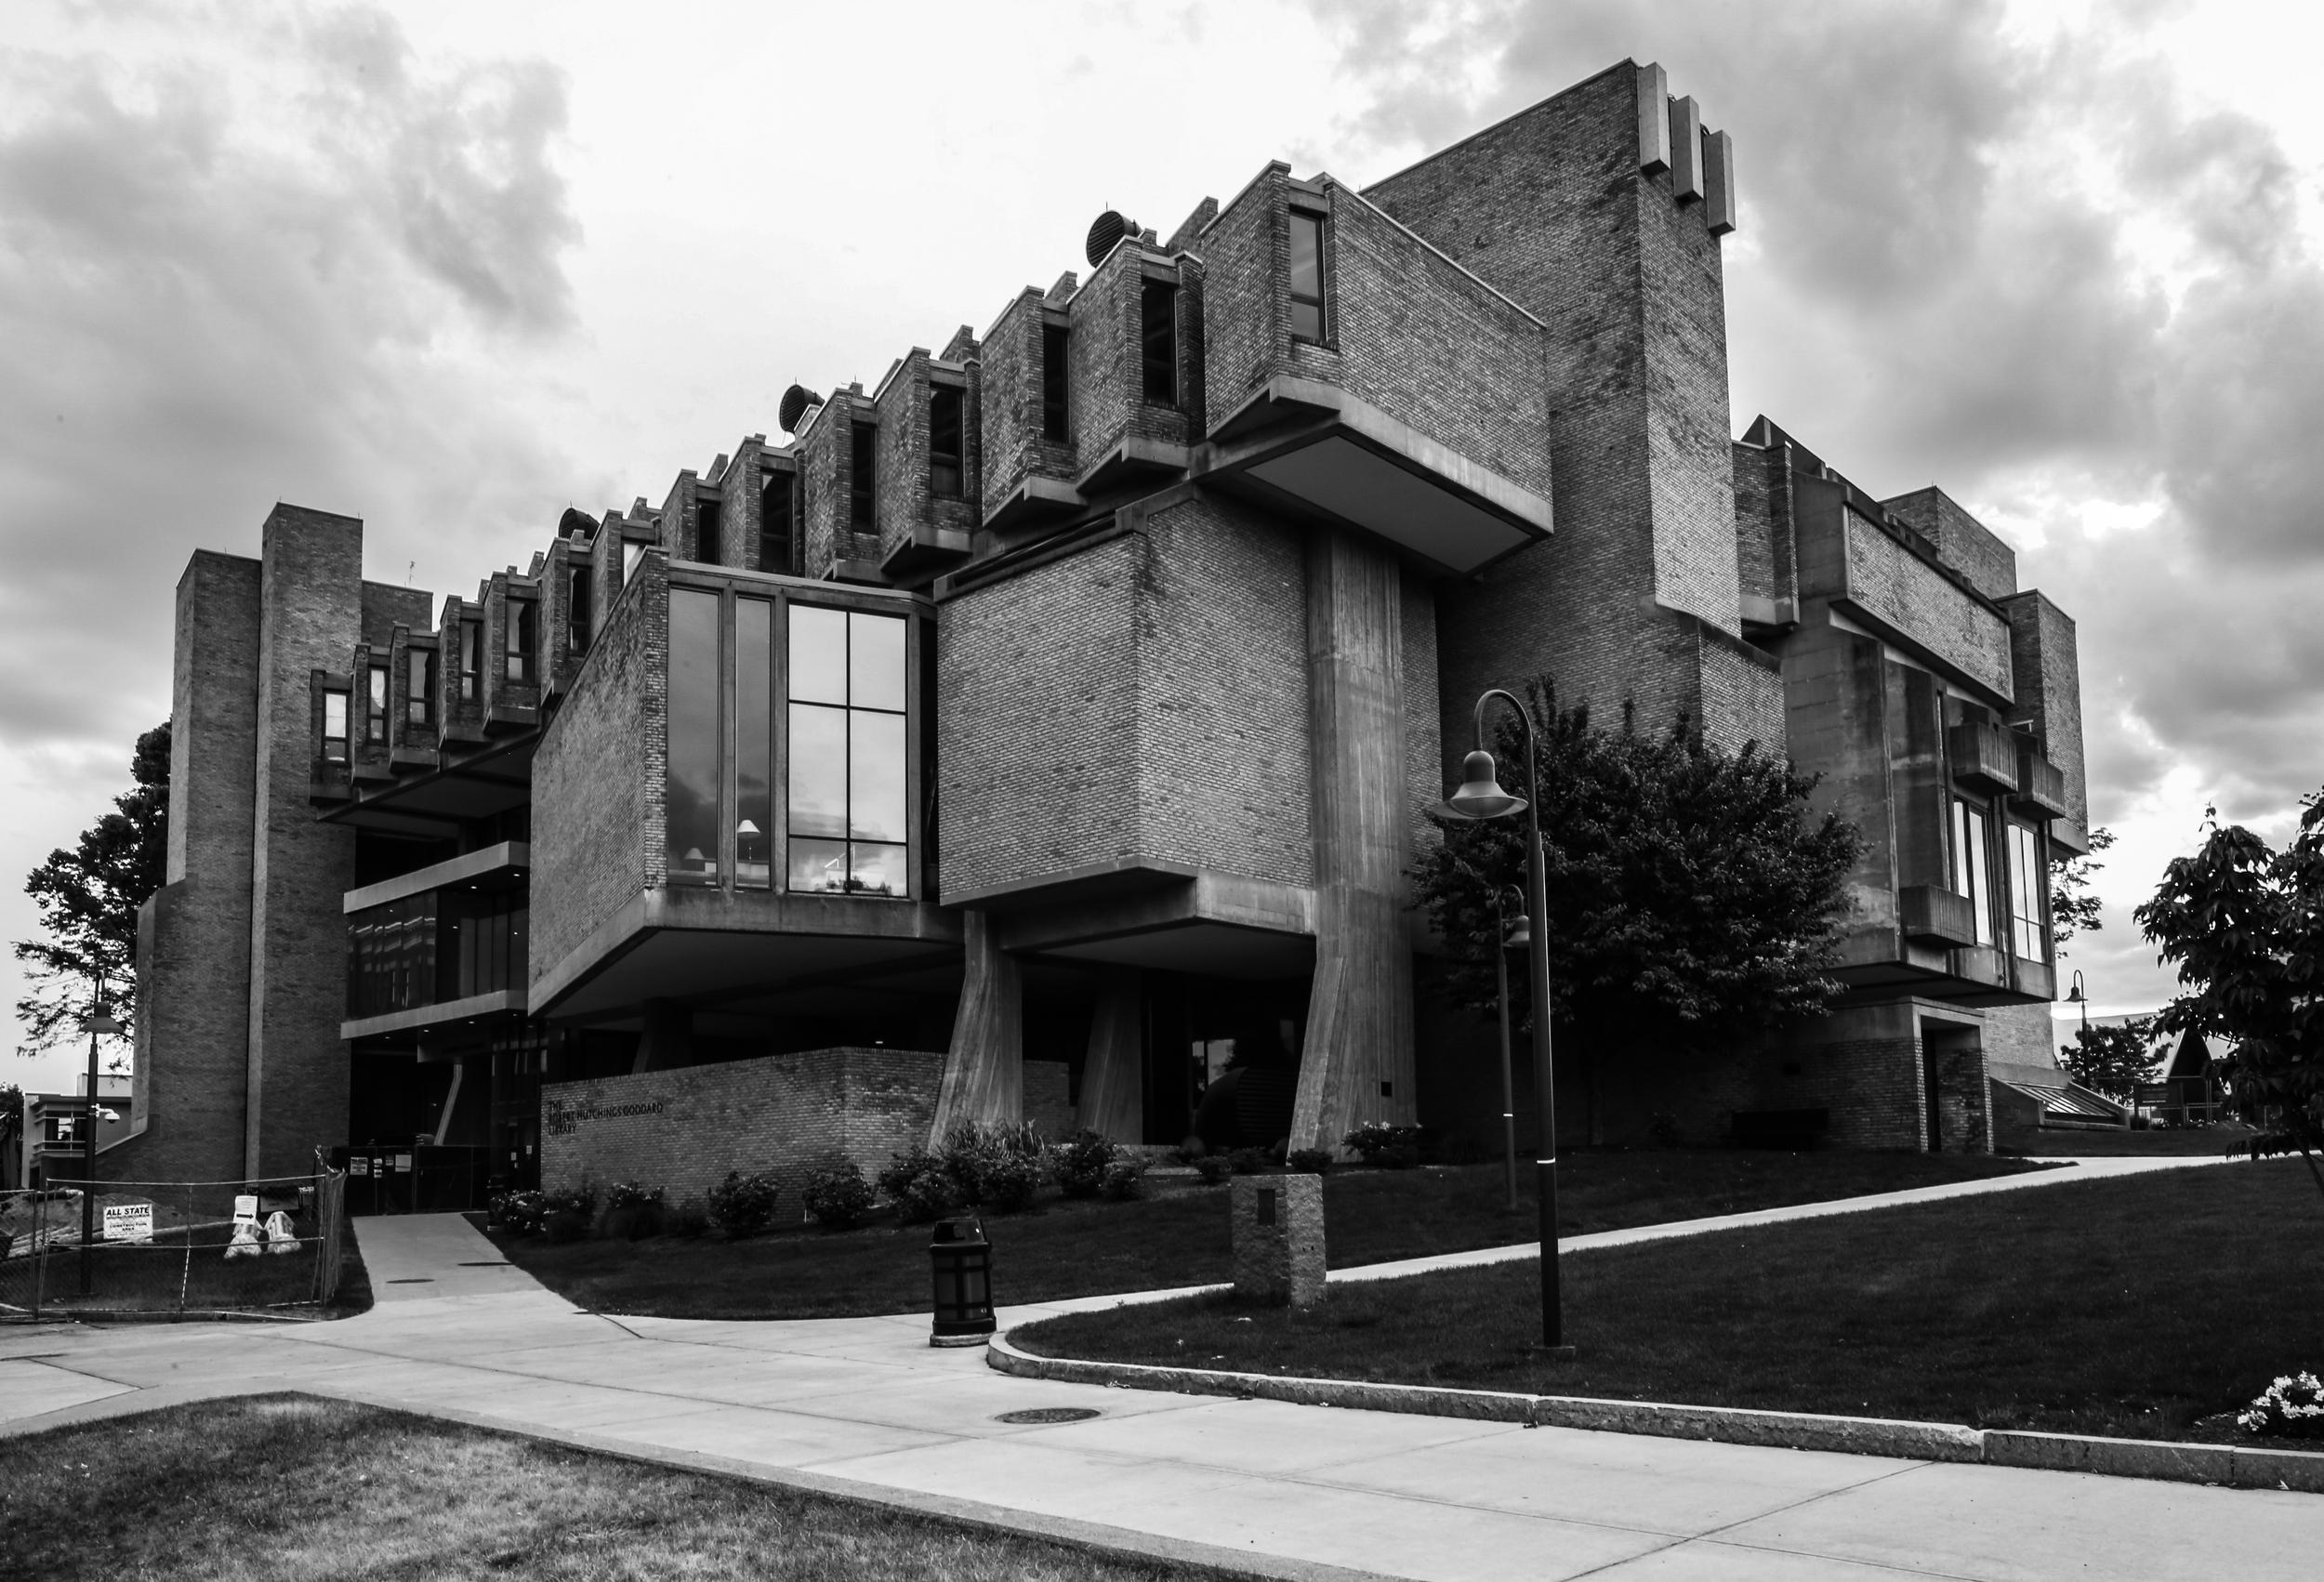 Robert H. Goddard Library at Clark University - Worcester, Massachusetts - John M. Johansen